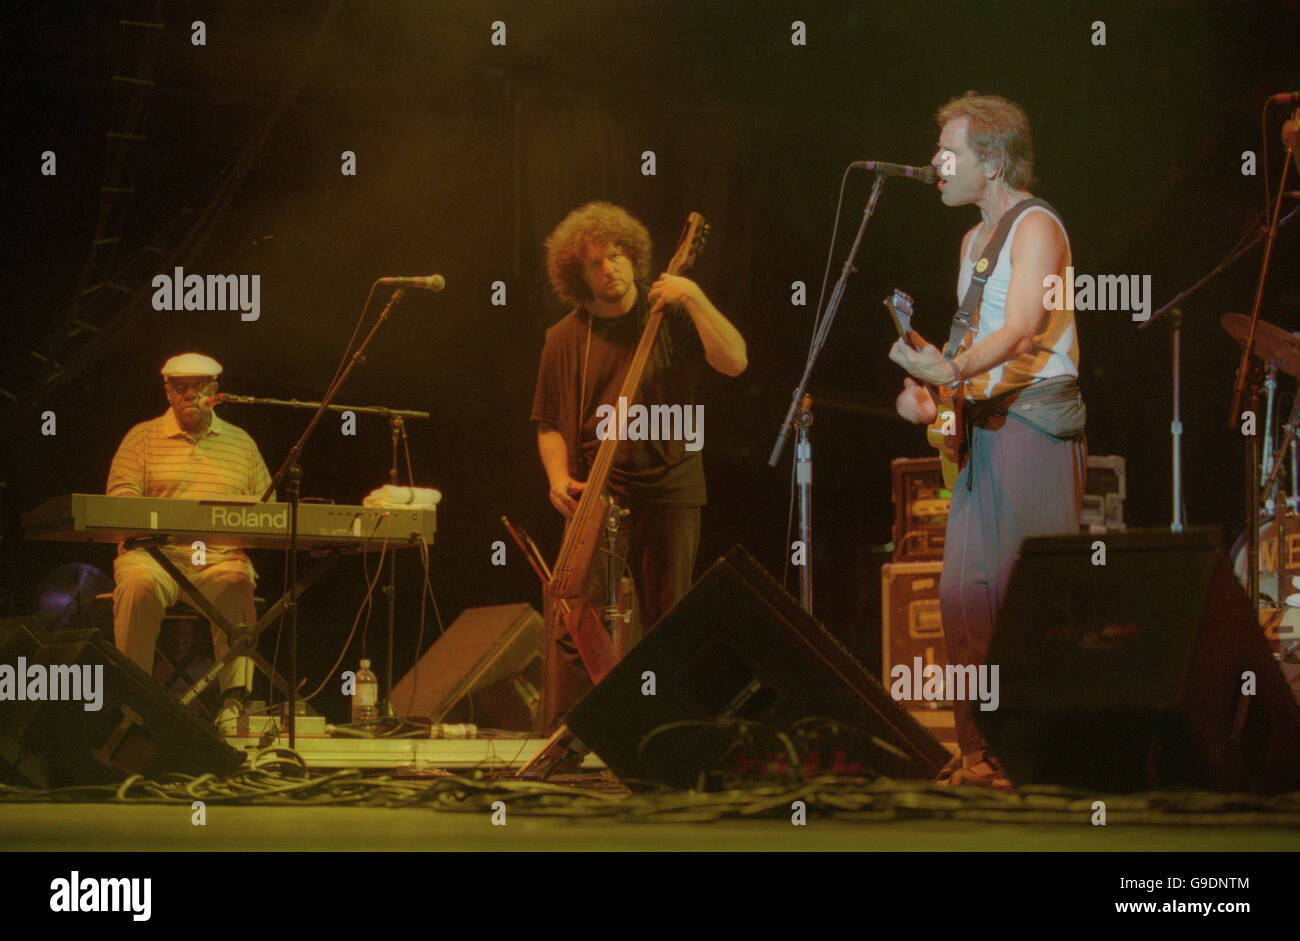 Bob Weir Of The Grateful Dead Stock Photos & Bob Weir Of The ...